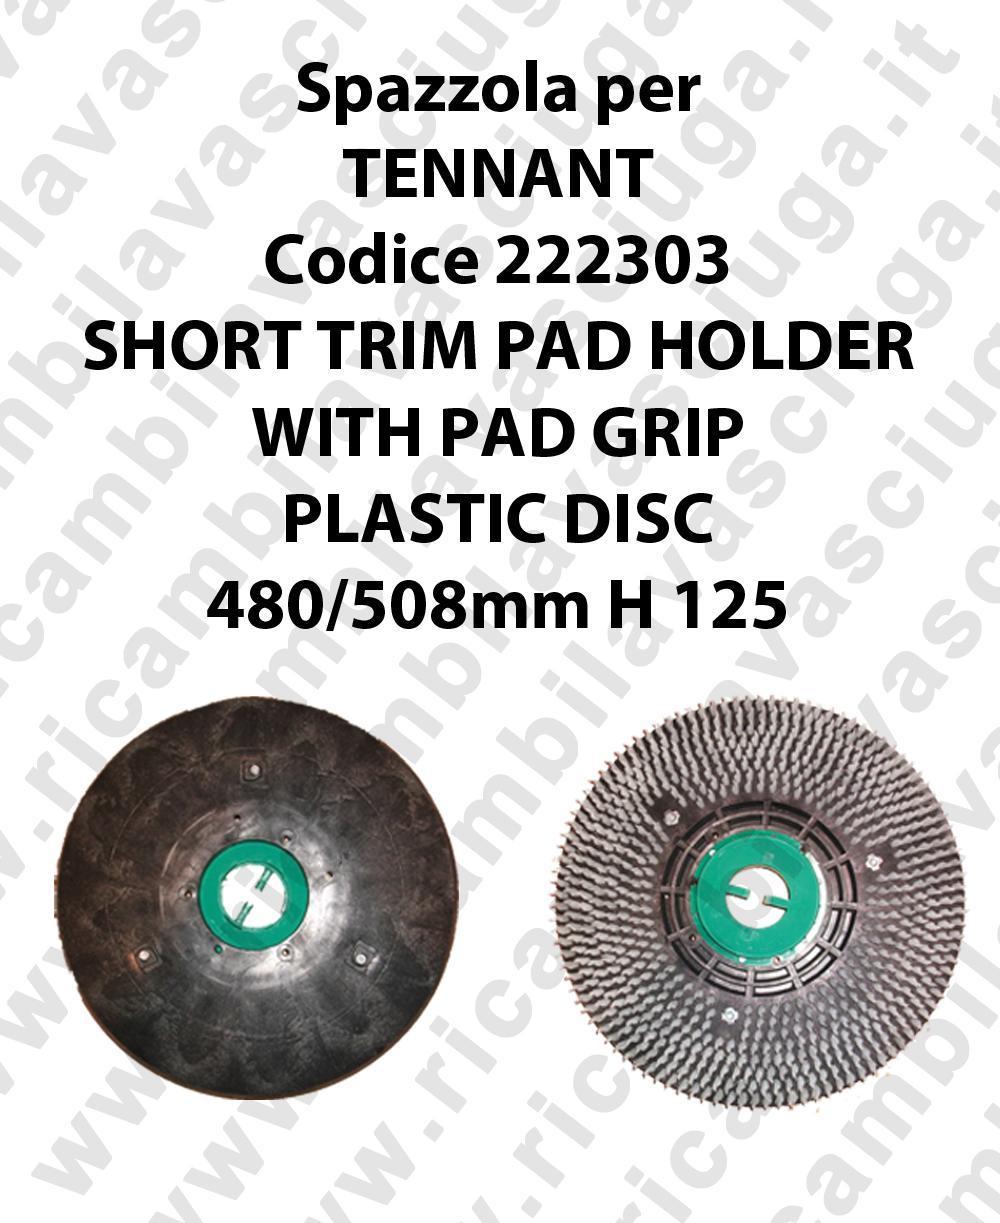 SHORT TRIM PAD HOLDER WITH PAD GRIP para fregadora TENNANT codeice 222303